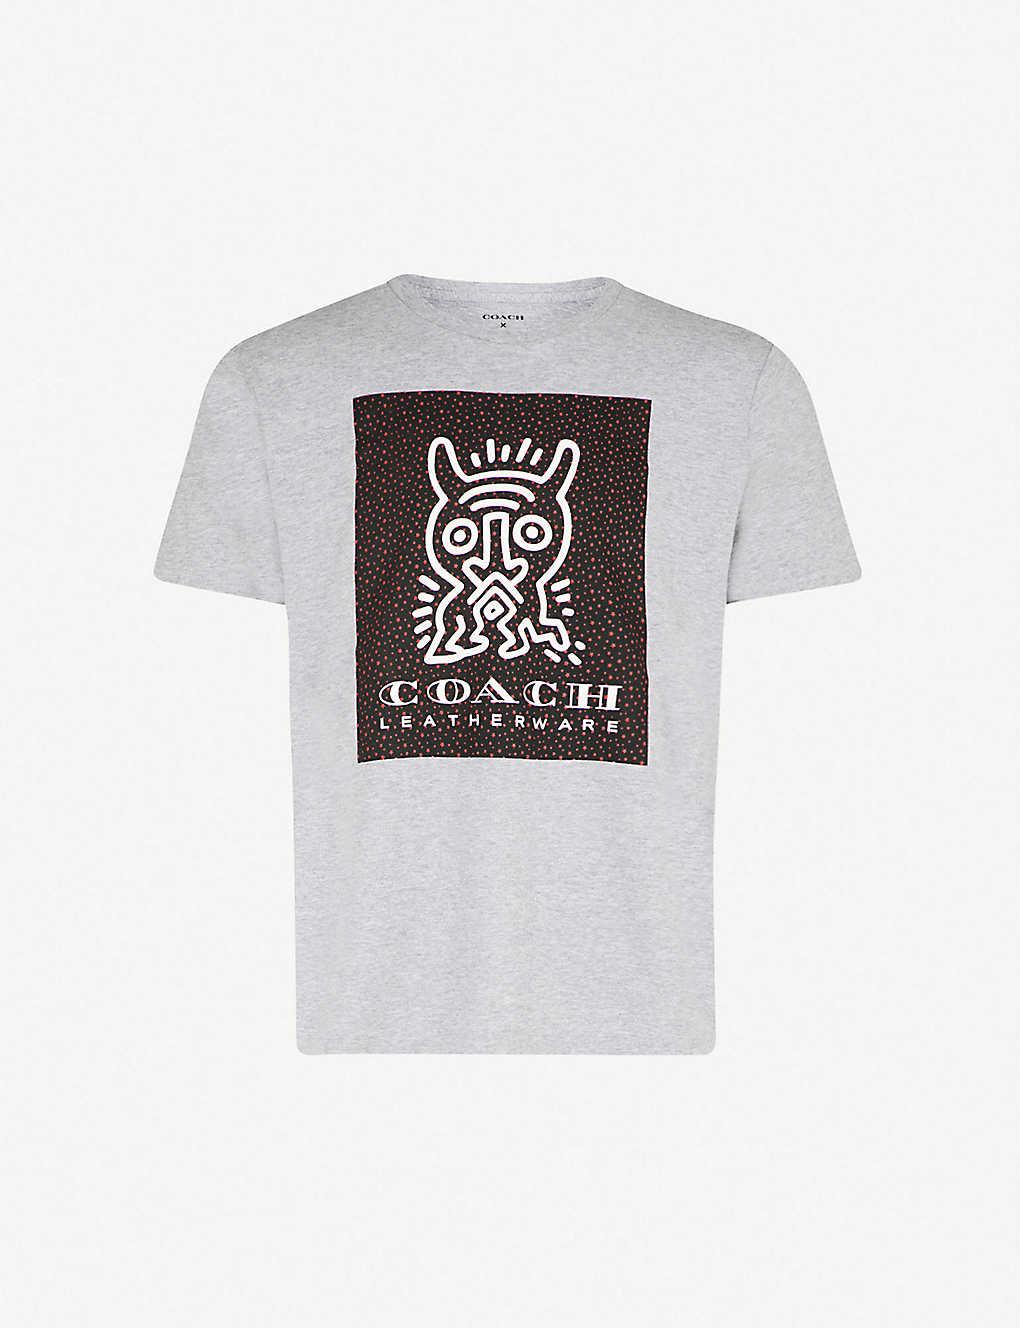 COACH 1941 - Coach X Keith Haring Monster cotton T-shirt ... c8fbf6ce9cc